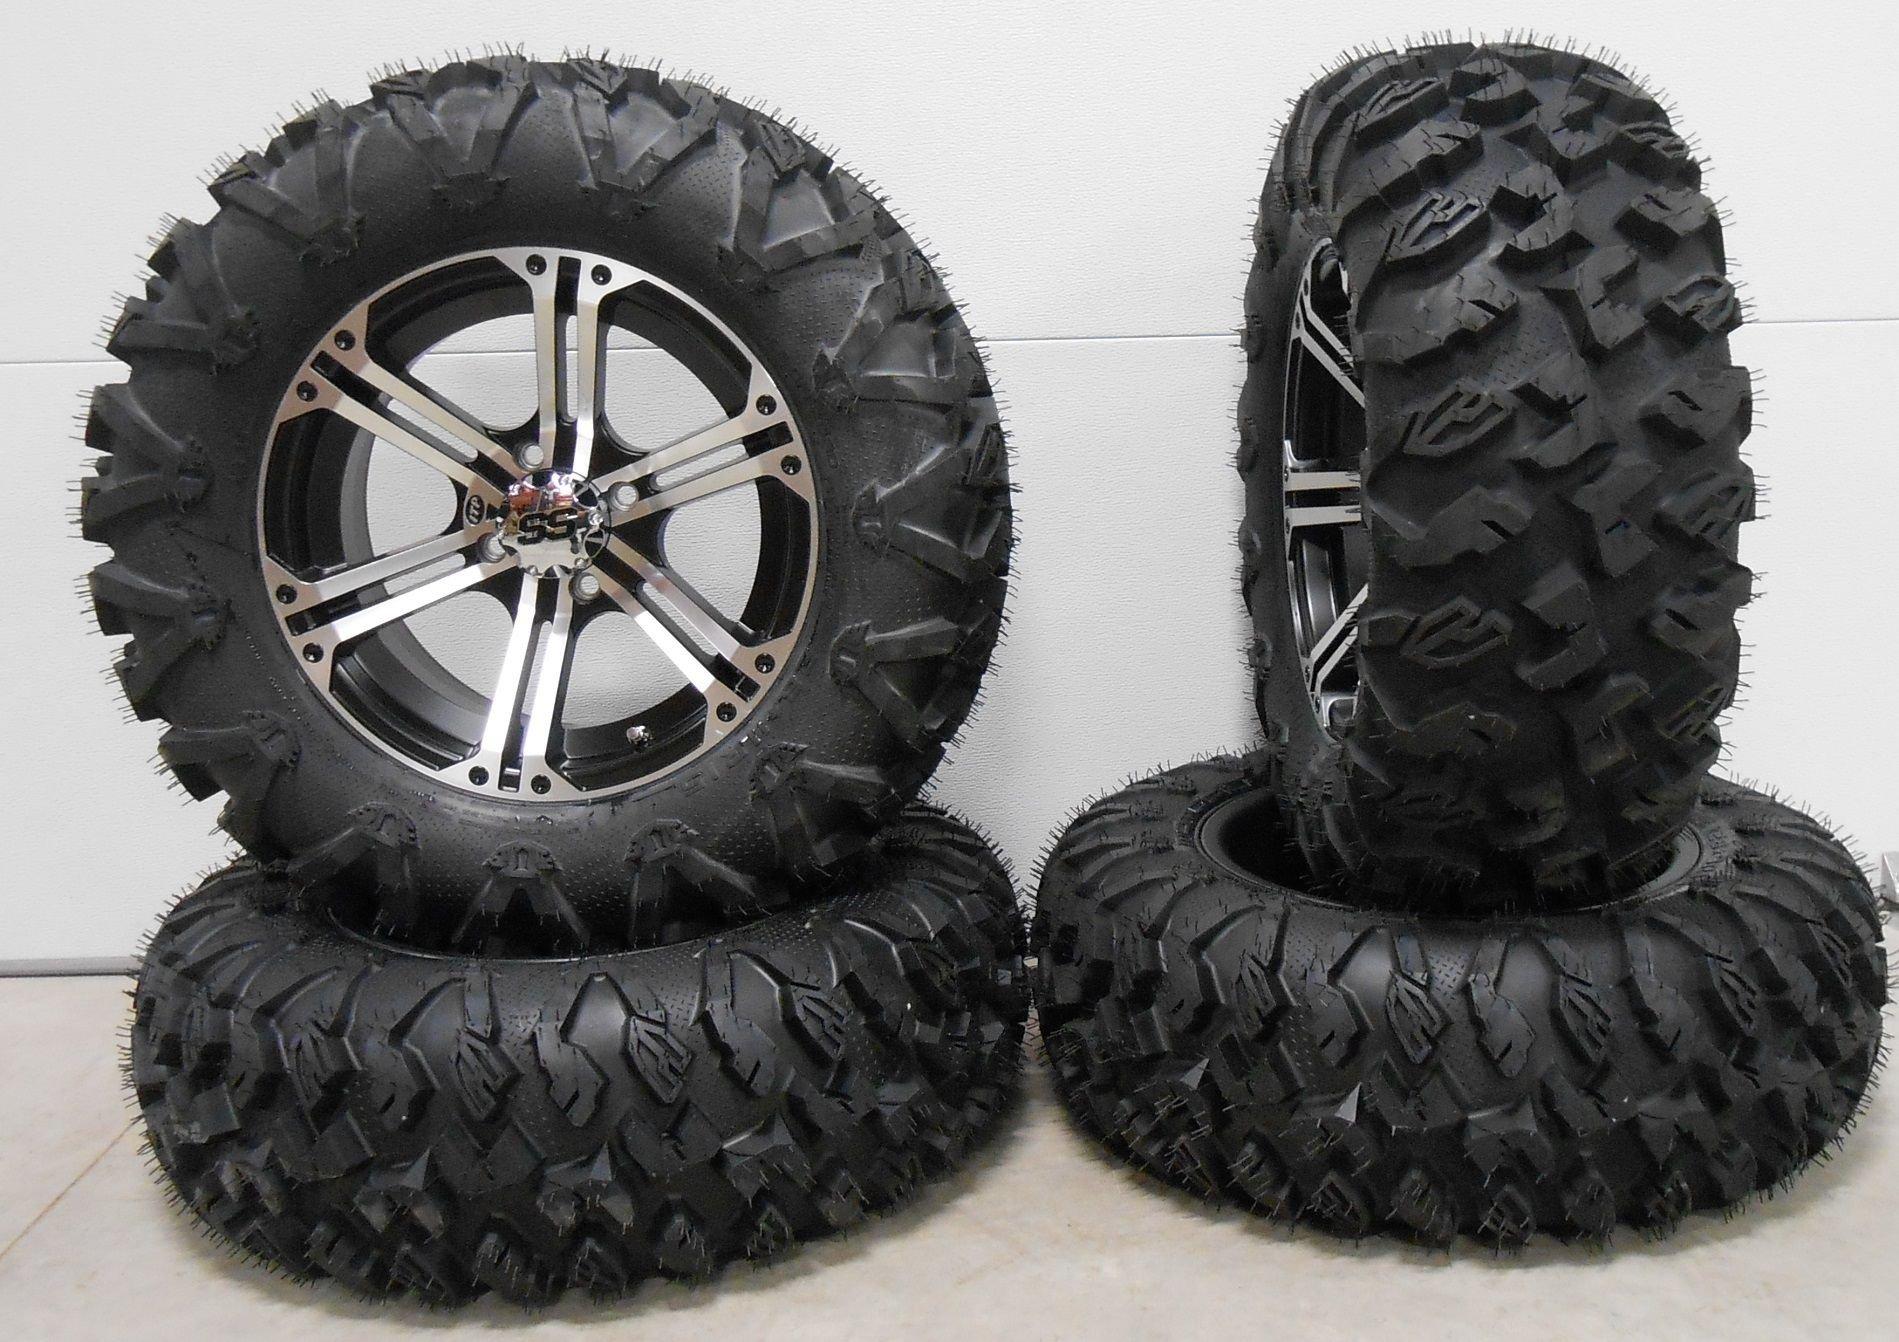 Bundle - 9 Items: ITP SS212 15'' Wheels Machined 28'' EFX MotoClaw Tires [4x156 Bolt Pattern 12mmx1.5 Lug Kit]